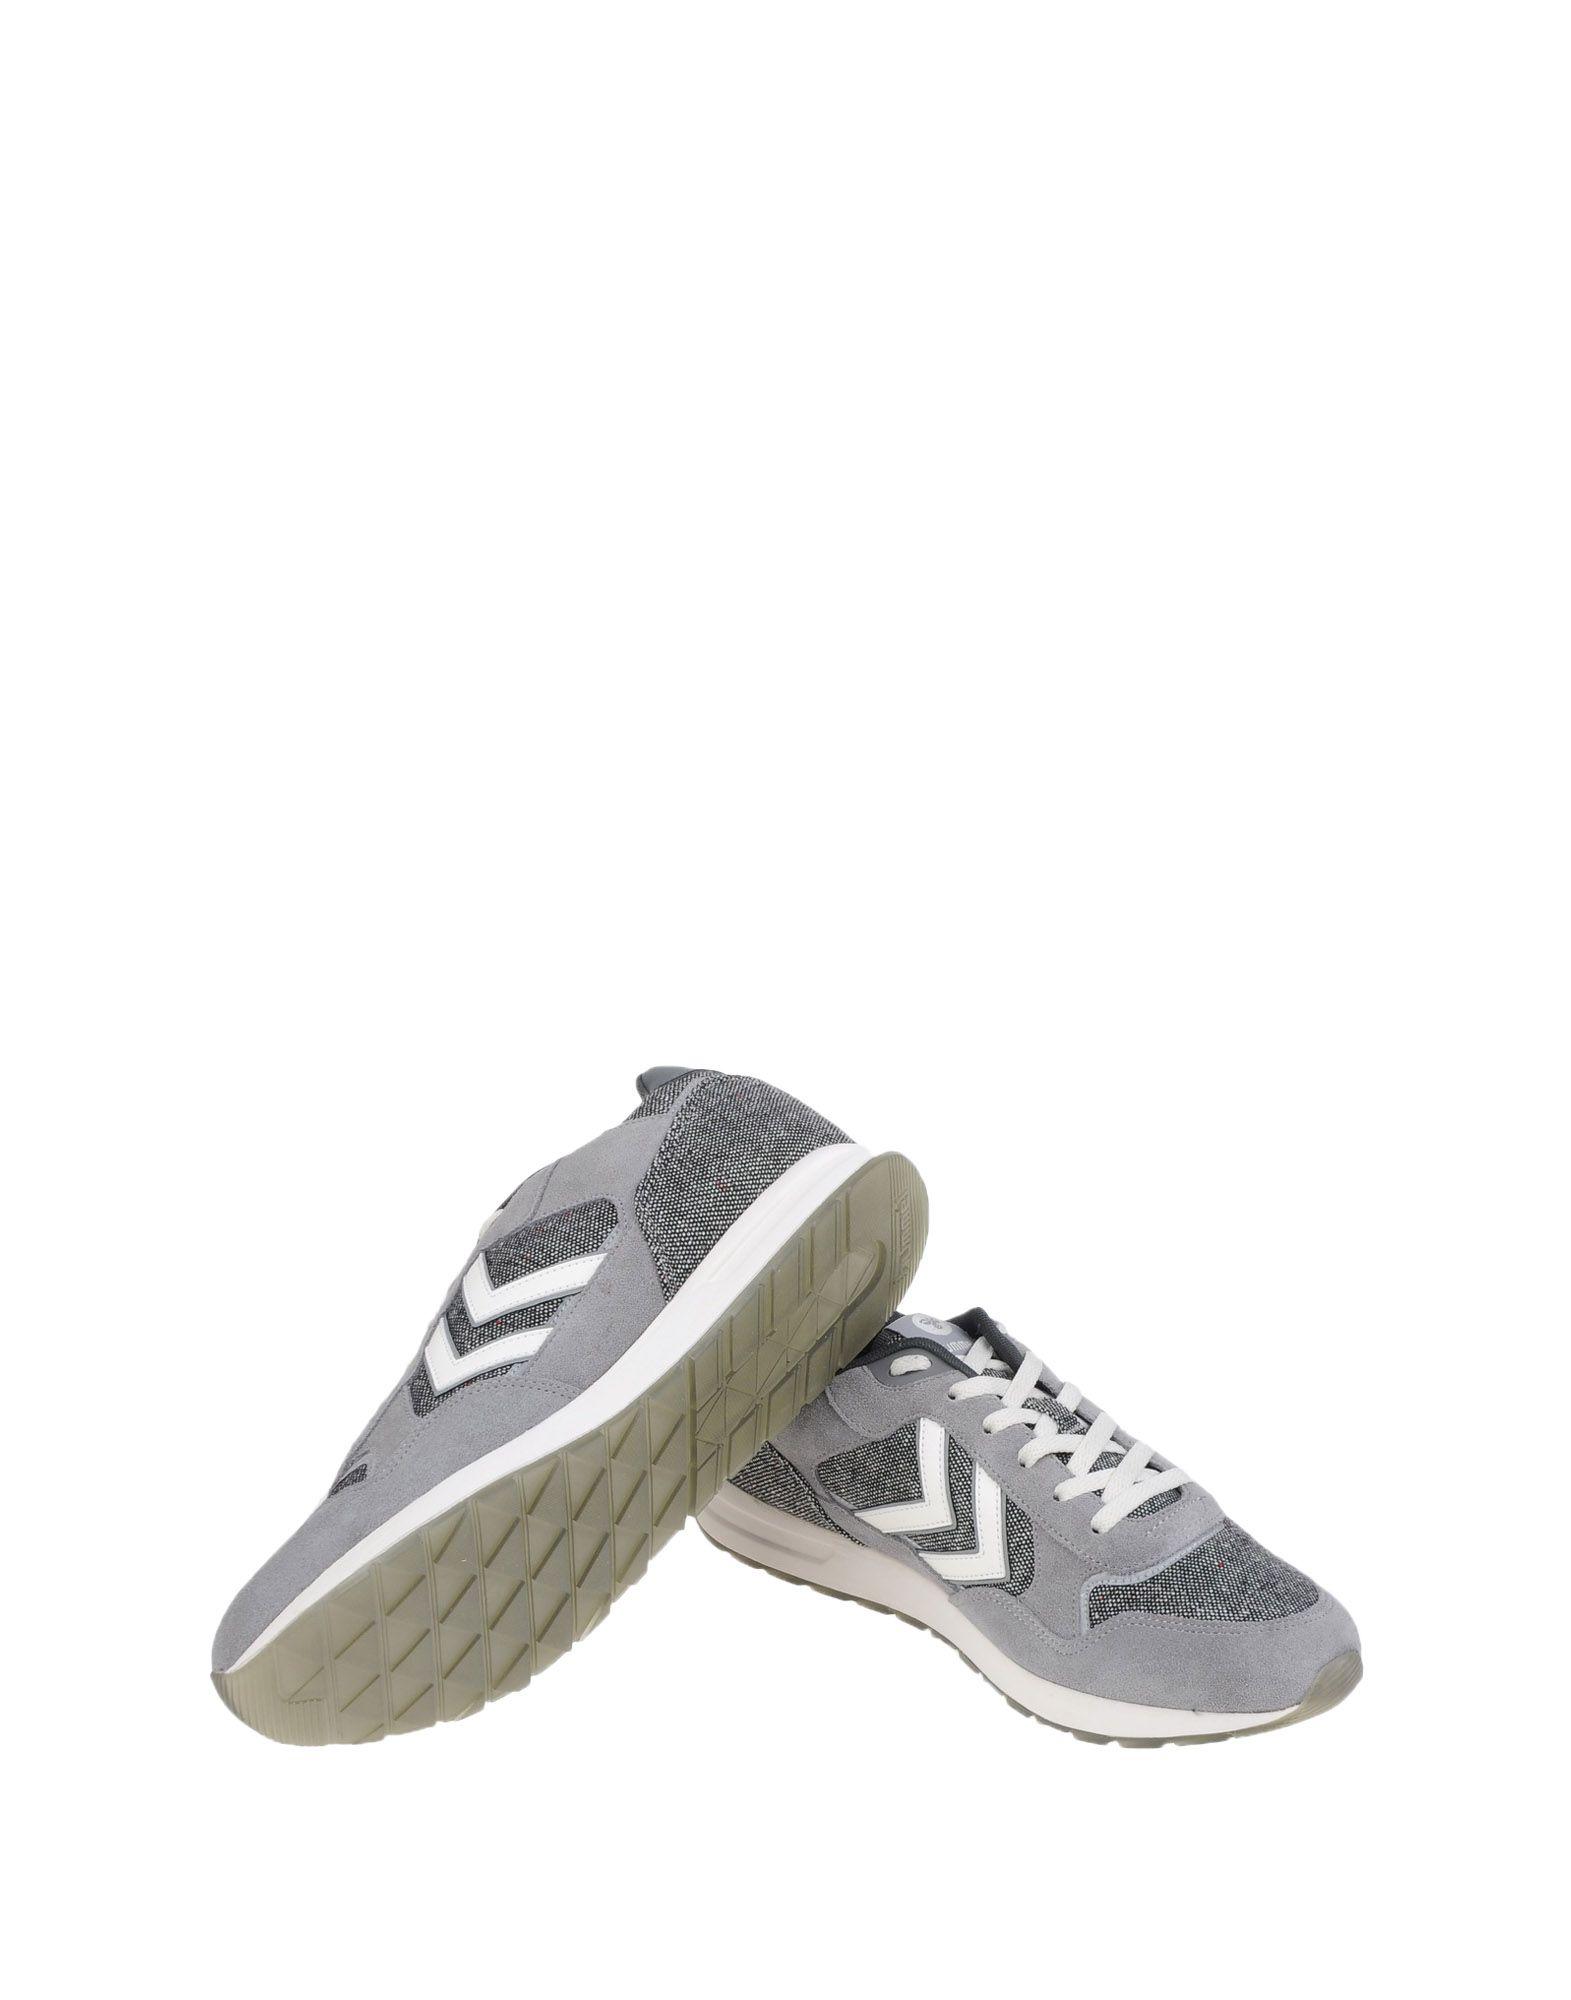 Hummel Marathona Evo Evo Evo Woolen Sneaker - Sneakers - Men Hummel Sneakers online on  Canada - 11110386CR 895274